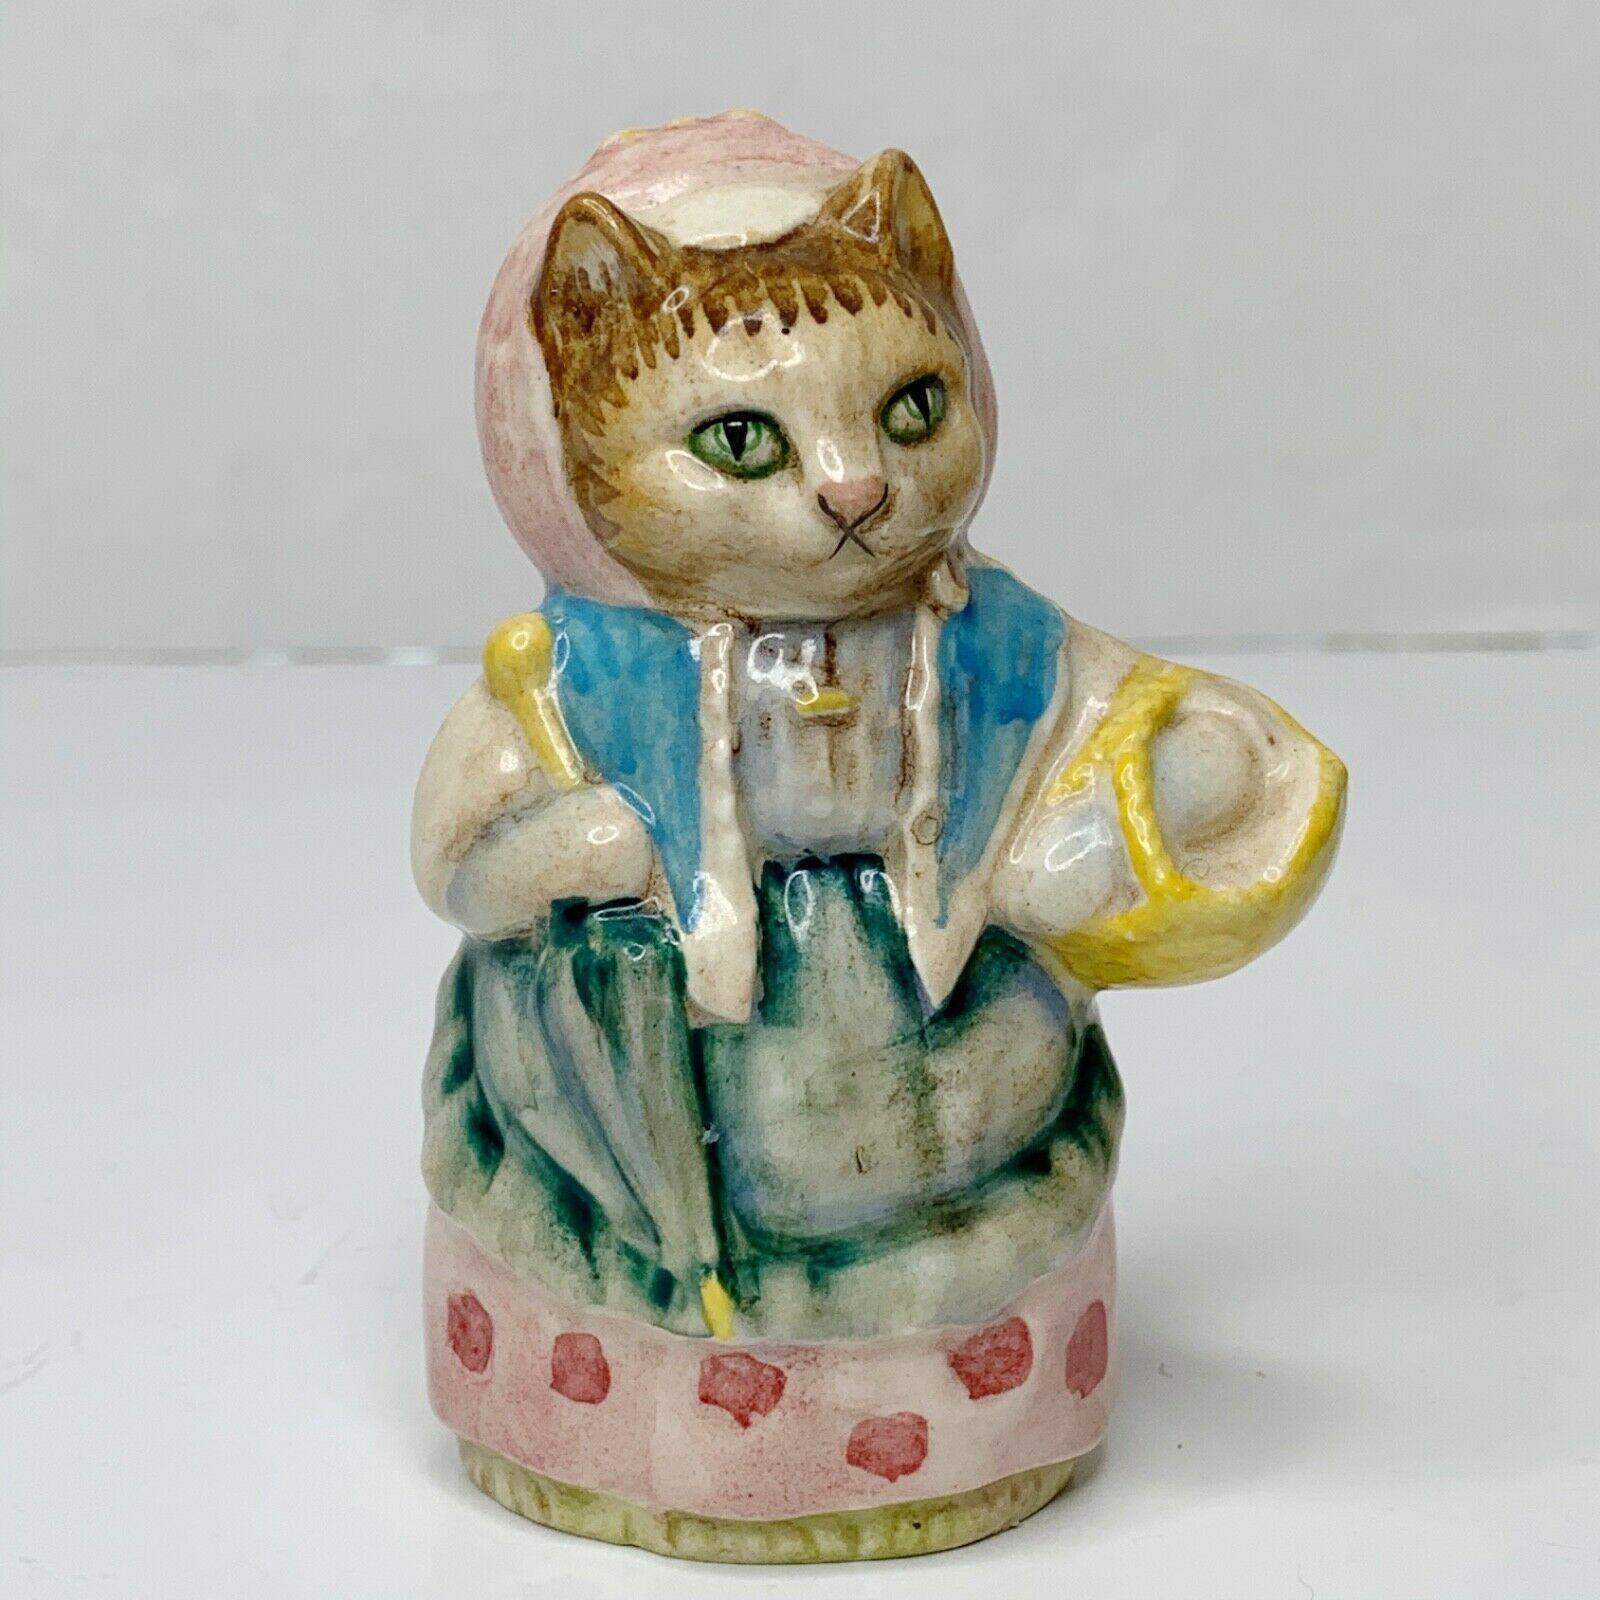 Beatrix Potter Figurine Cousin Ribby Beswick England F. Warne 1973-74  - $28.84